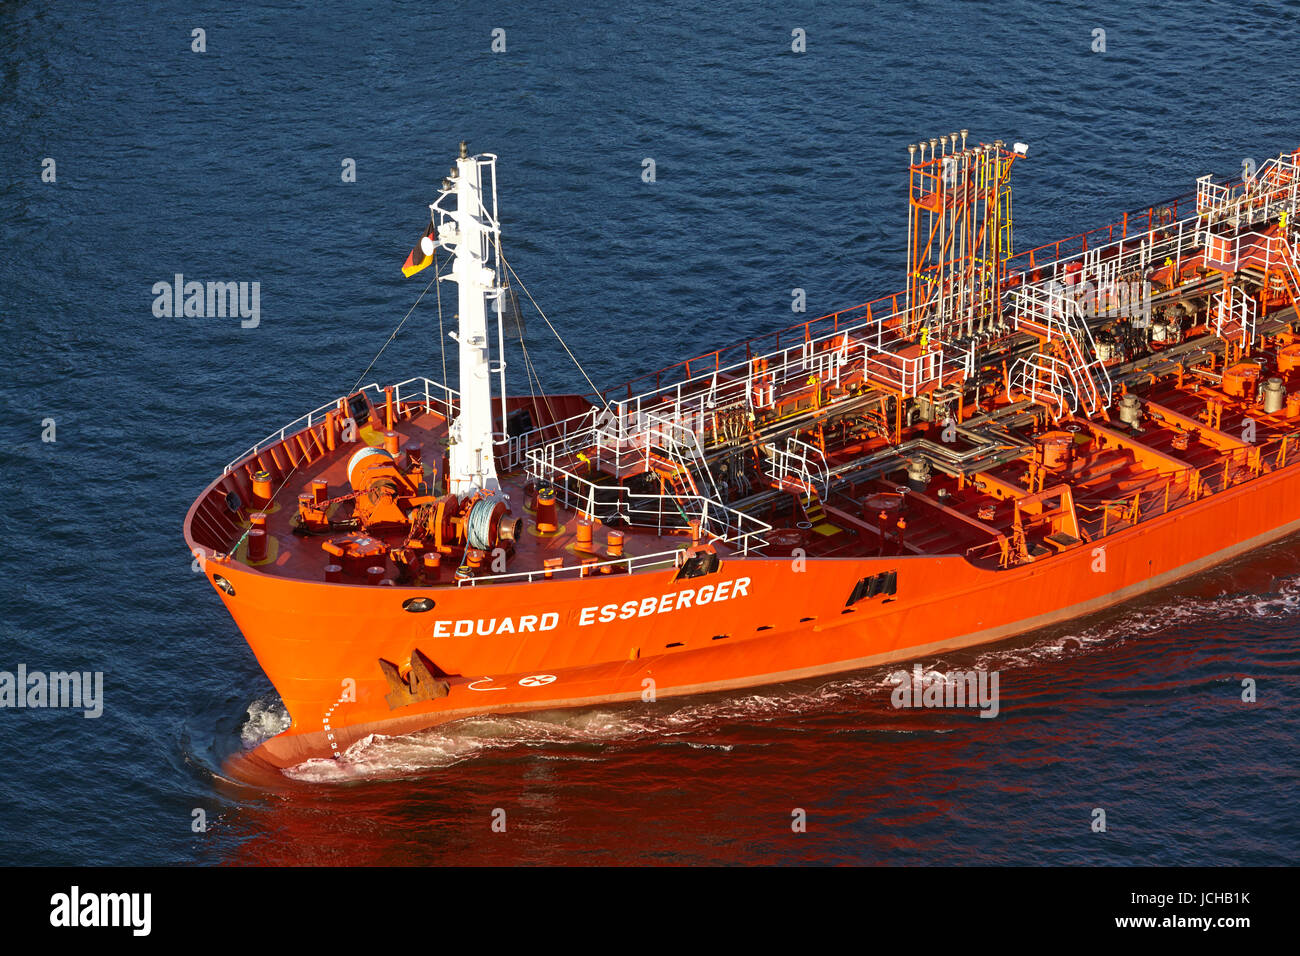 The tanker Eduard Essberger at the Kiel Canal near the lock Kiel-Holtenau taken on September 3, 2014. - Stock Image